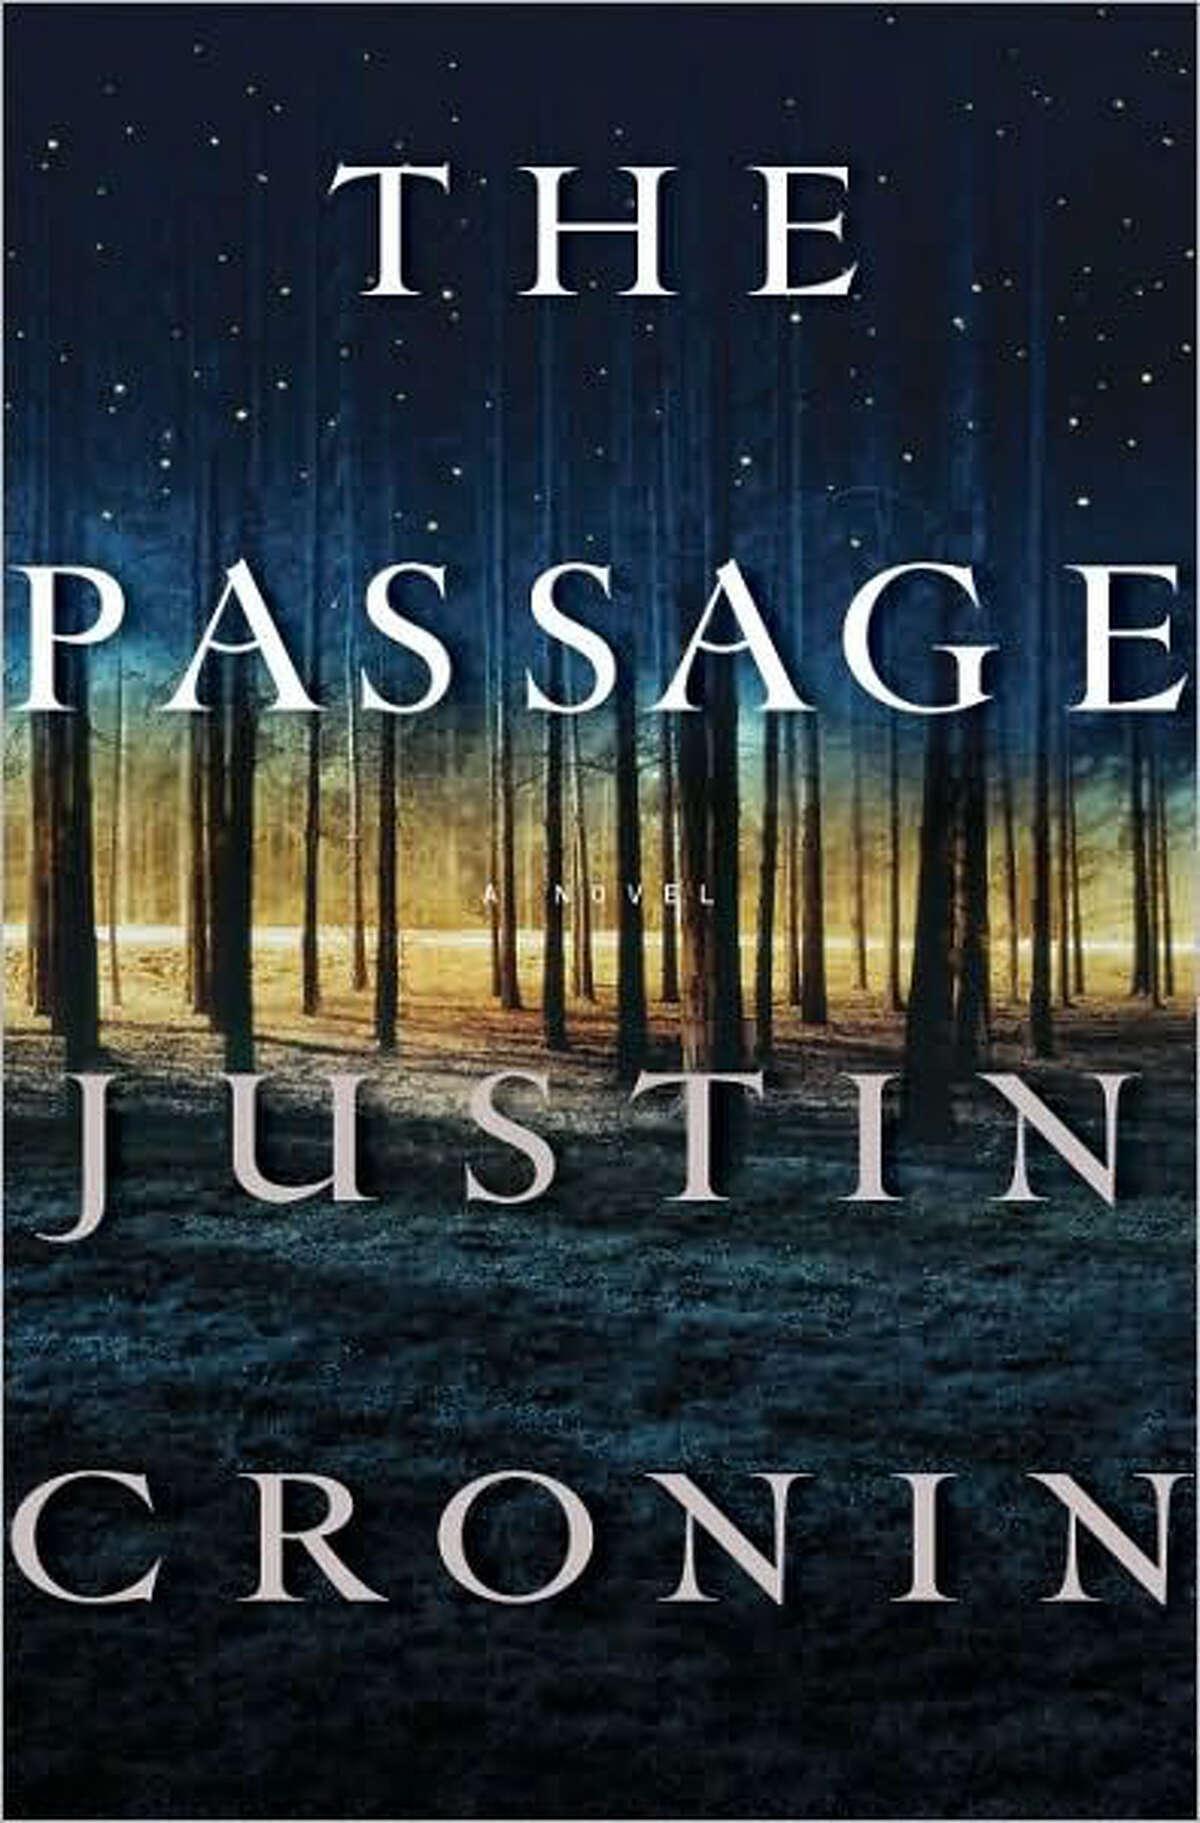 Justin Cronin's novel